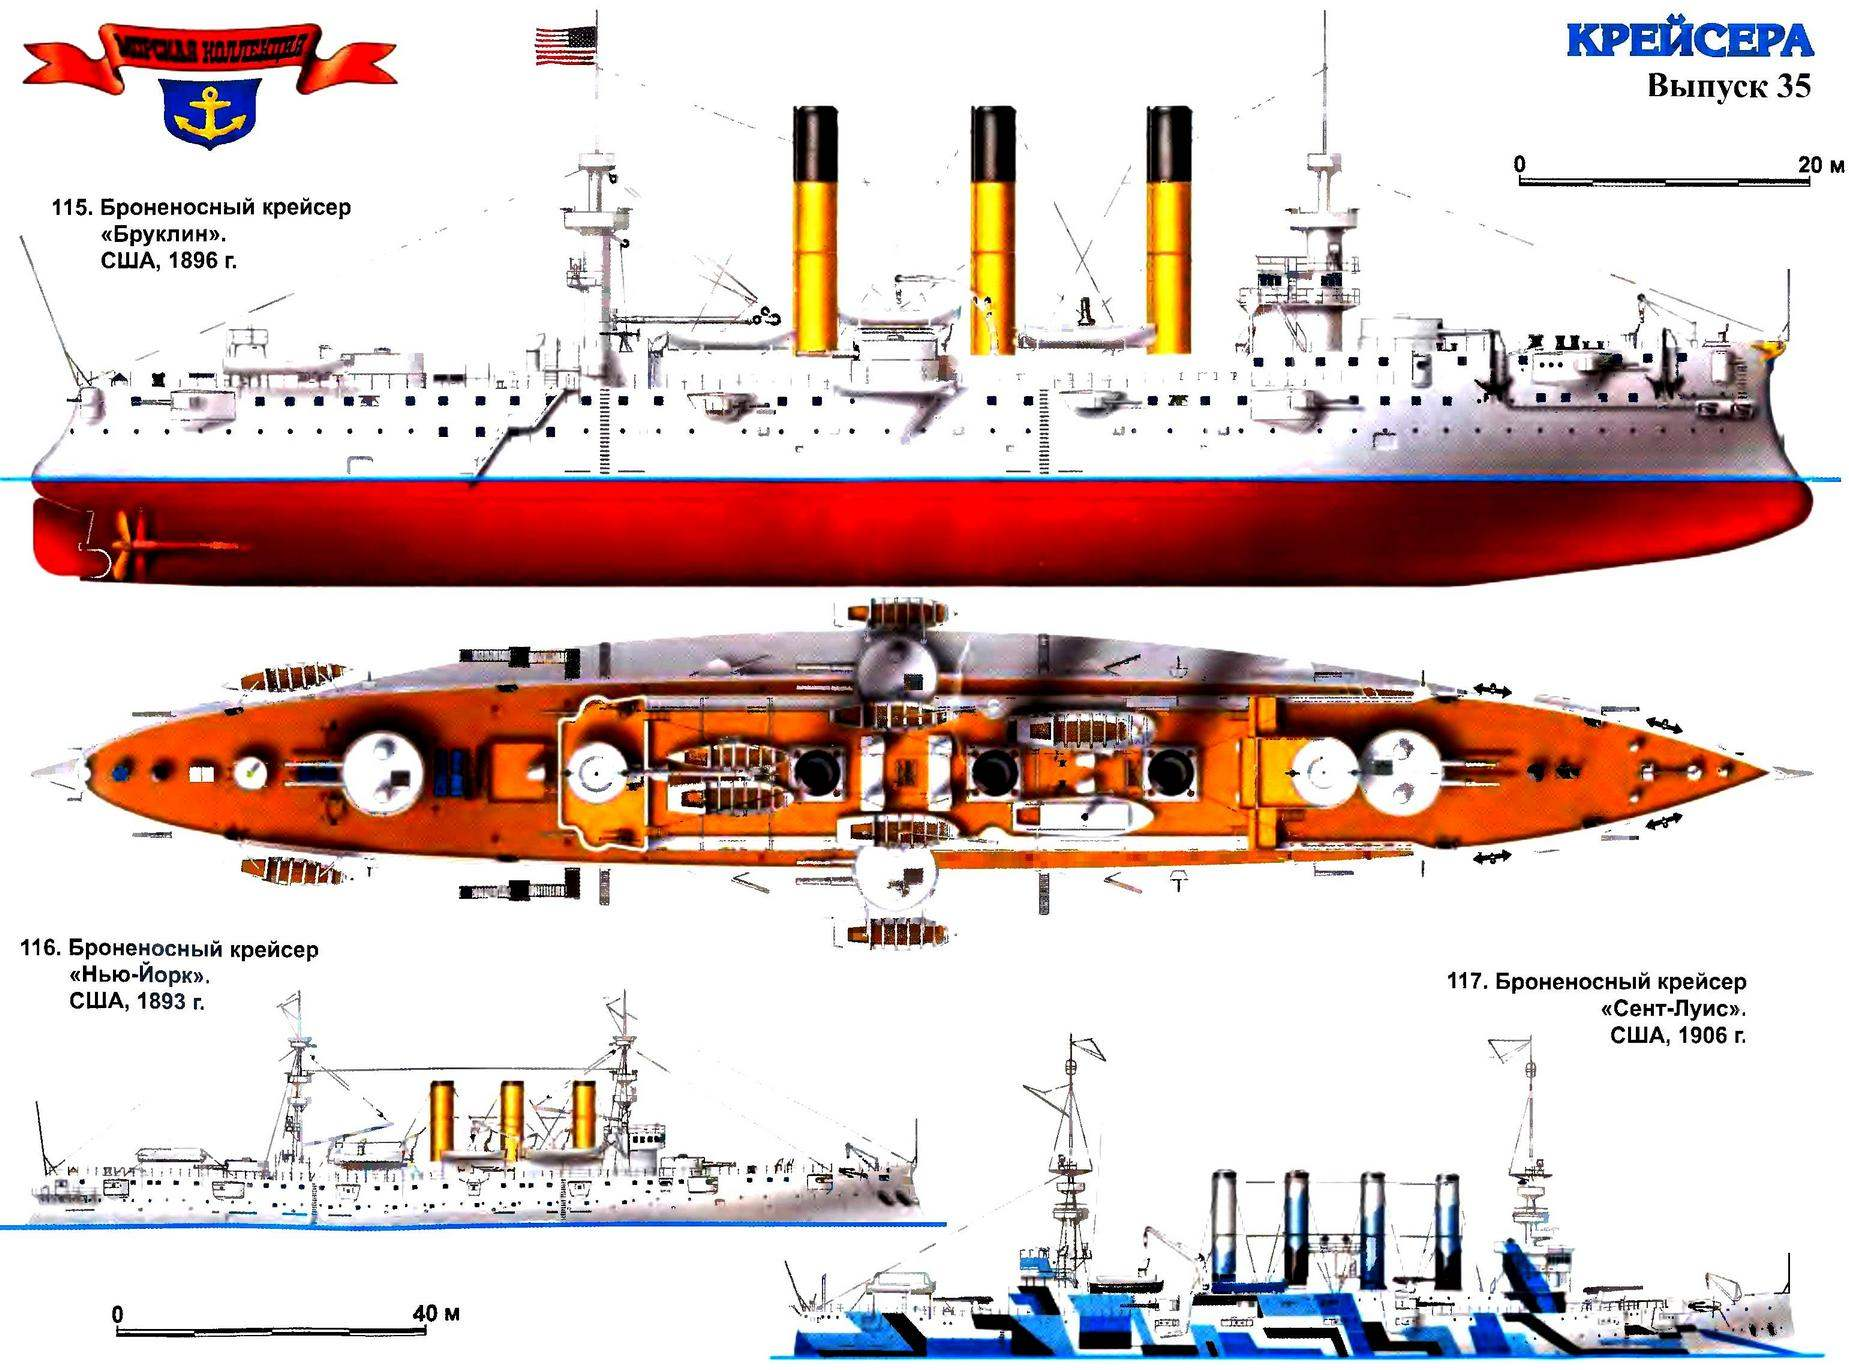 115. Броненосный крейсер «Бруклин» (США, 1896 г.)